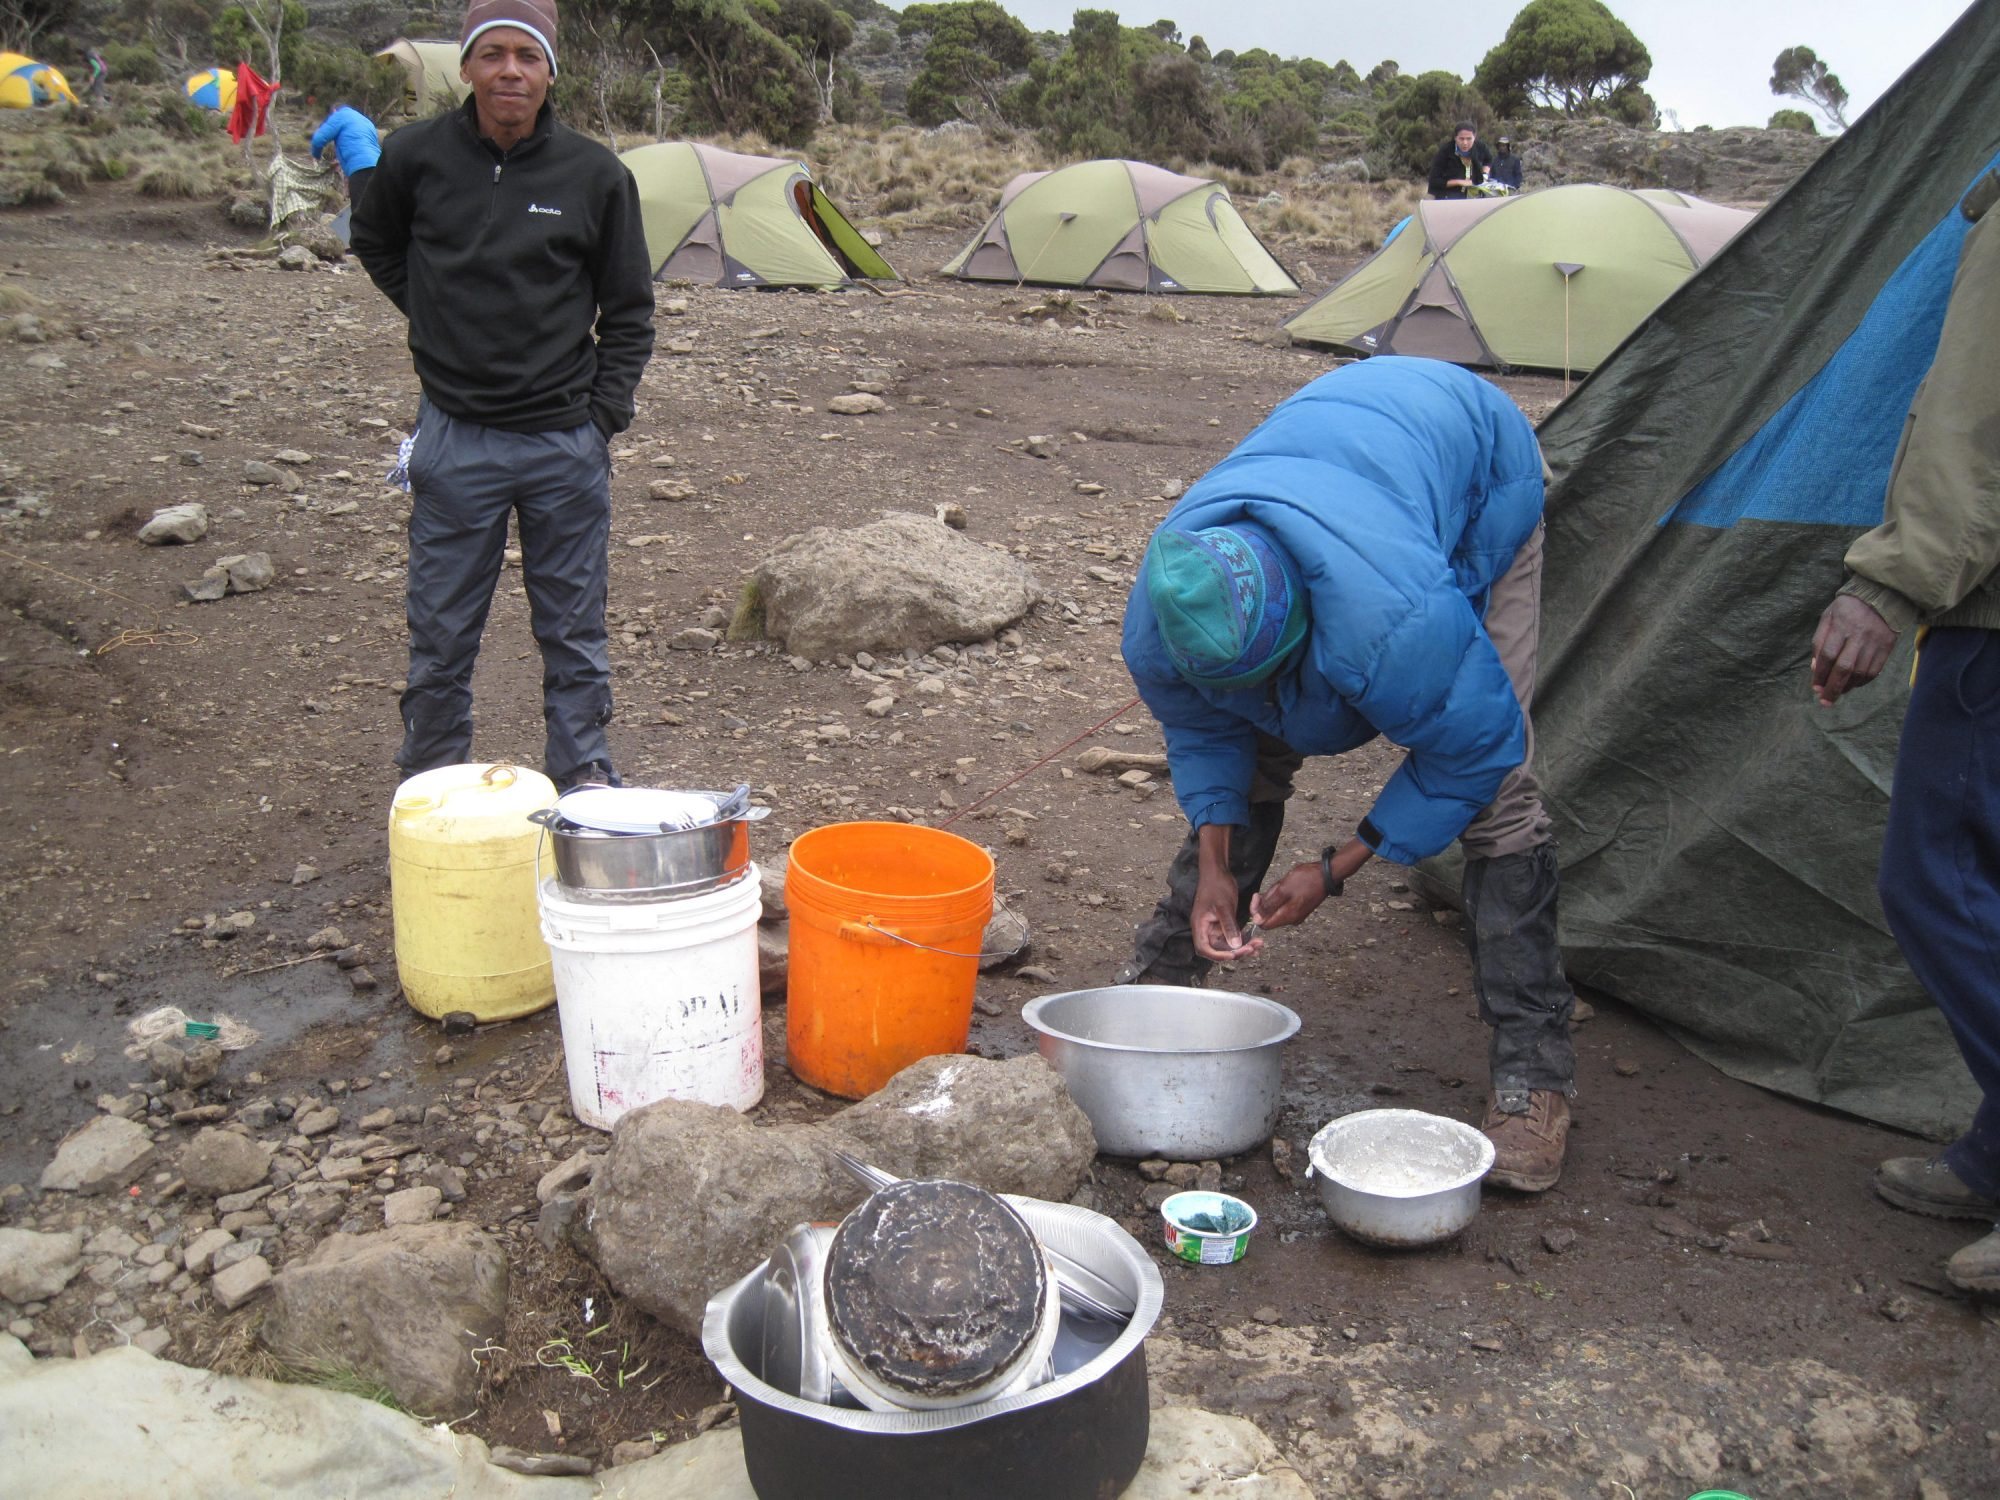 Abwasch am Kilimandscharo, Kilimandscharo, Kilimandscharo besteigen, Tansania, Afrika, Kilimandscharo Tour, Erfahrungsbericht, Machame Route